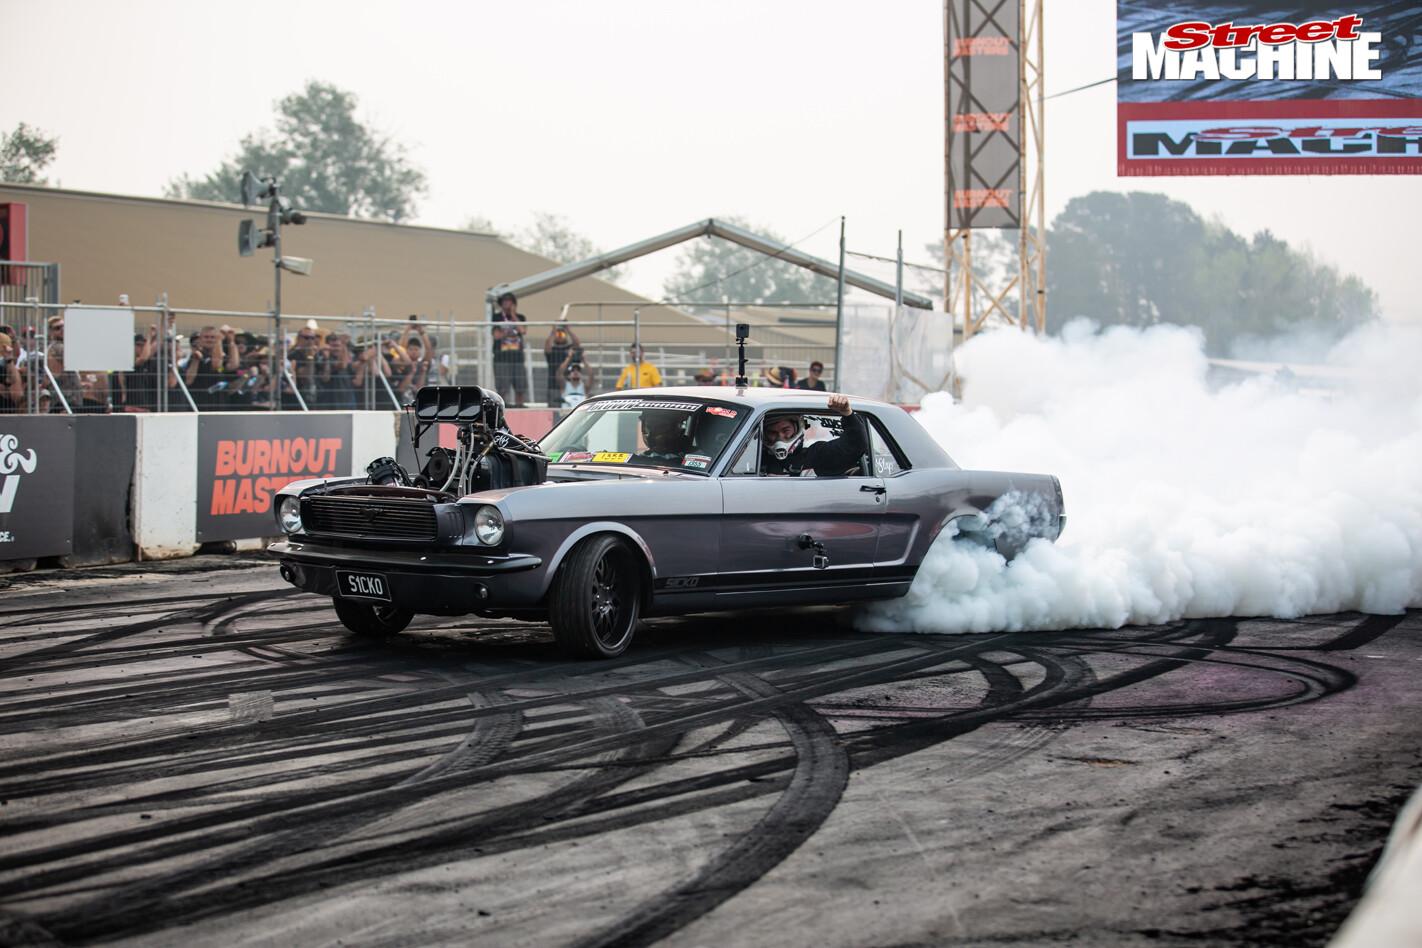 S1CKO Mustang burnout car